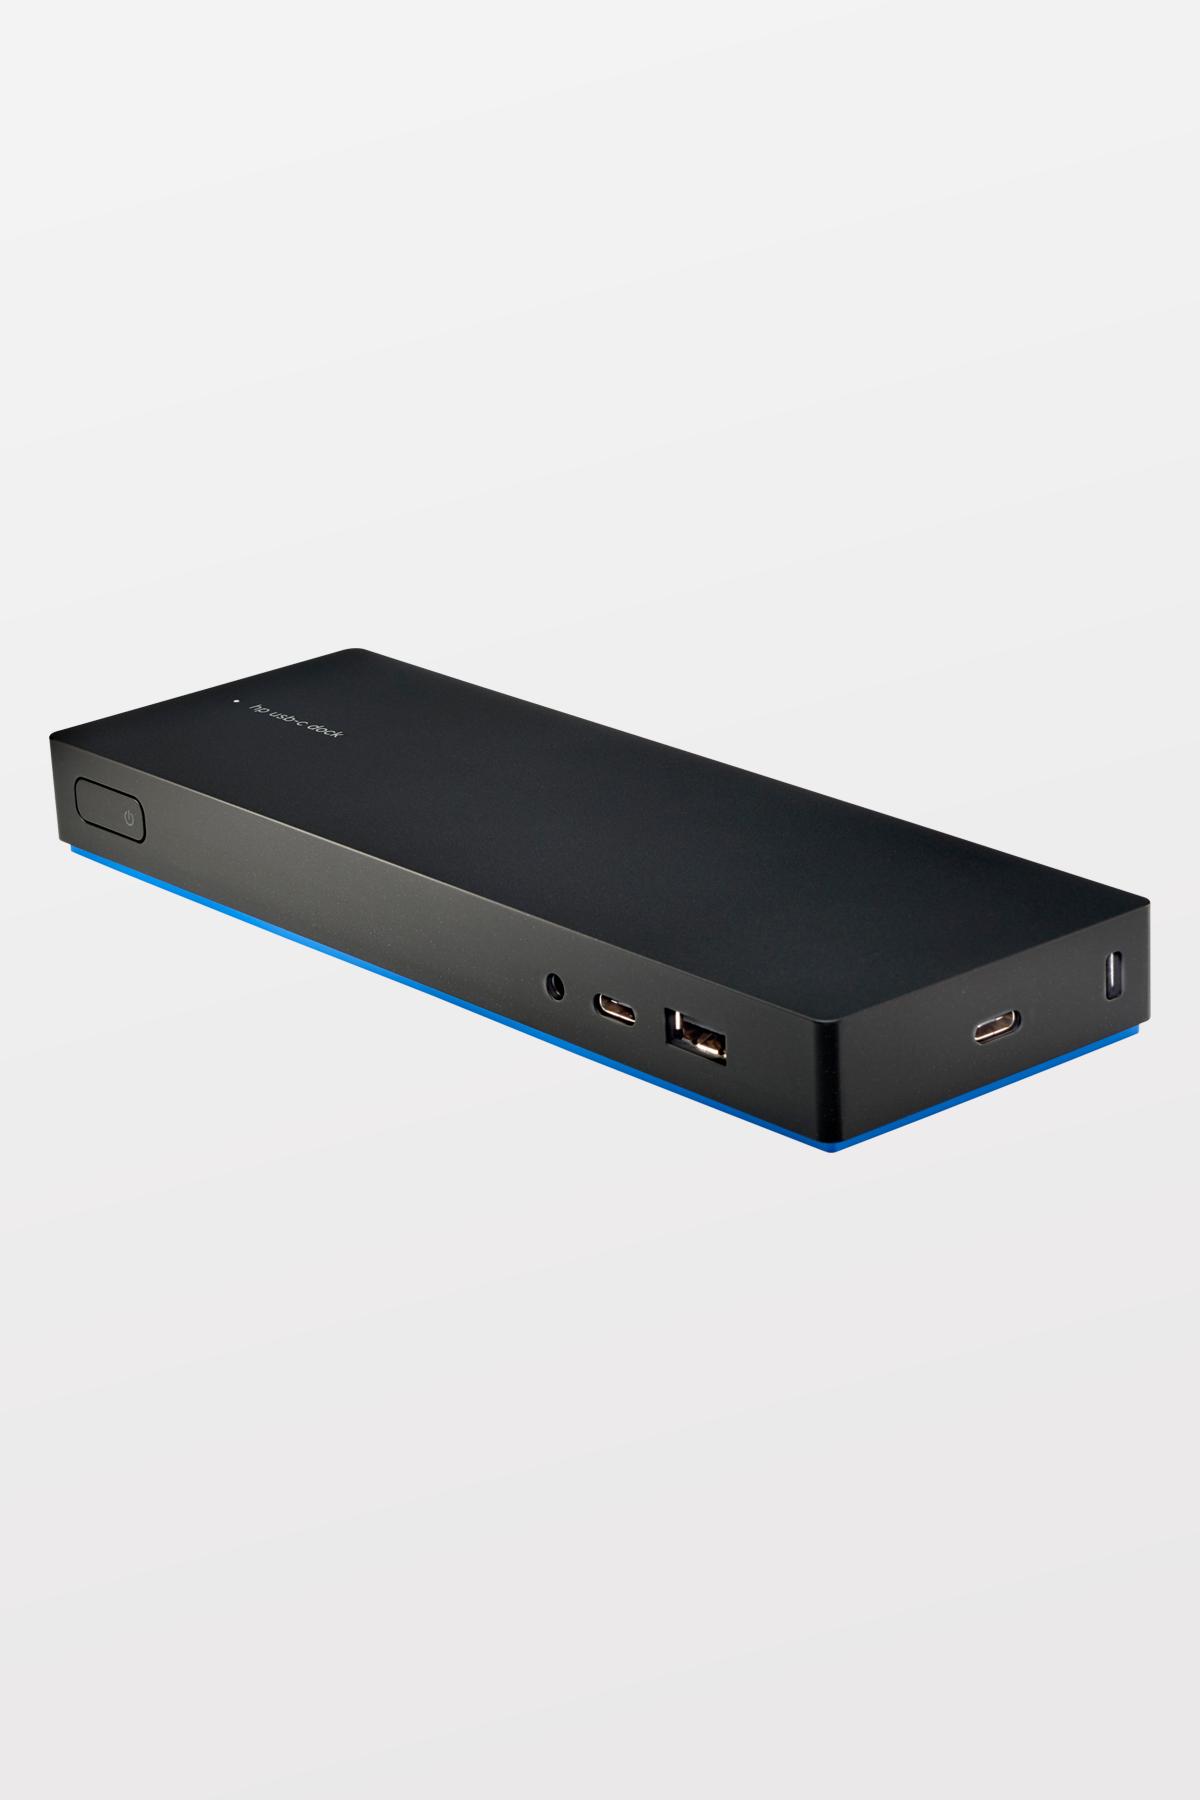 HP - USB-C Dock G4 - USB-C/USB3/USB2/HDMI/DP/RJ45/Audio